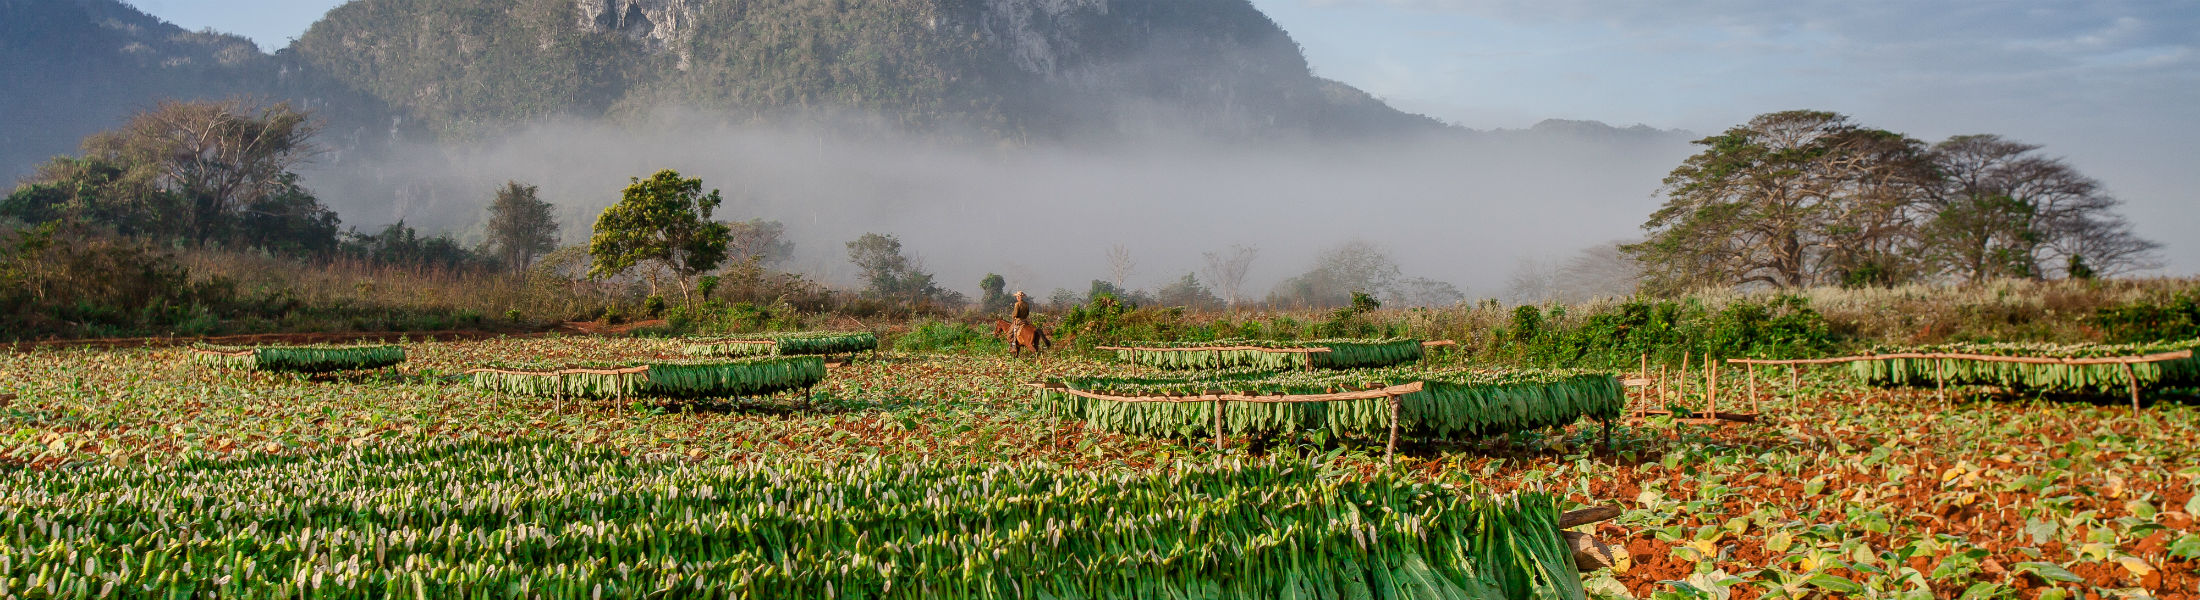 Vineales Cuba tobacco region